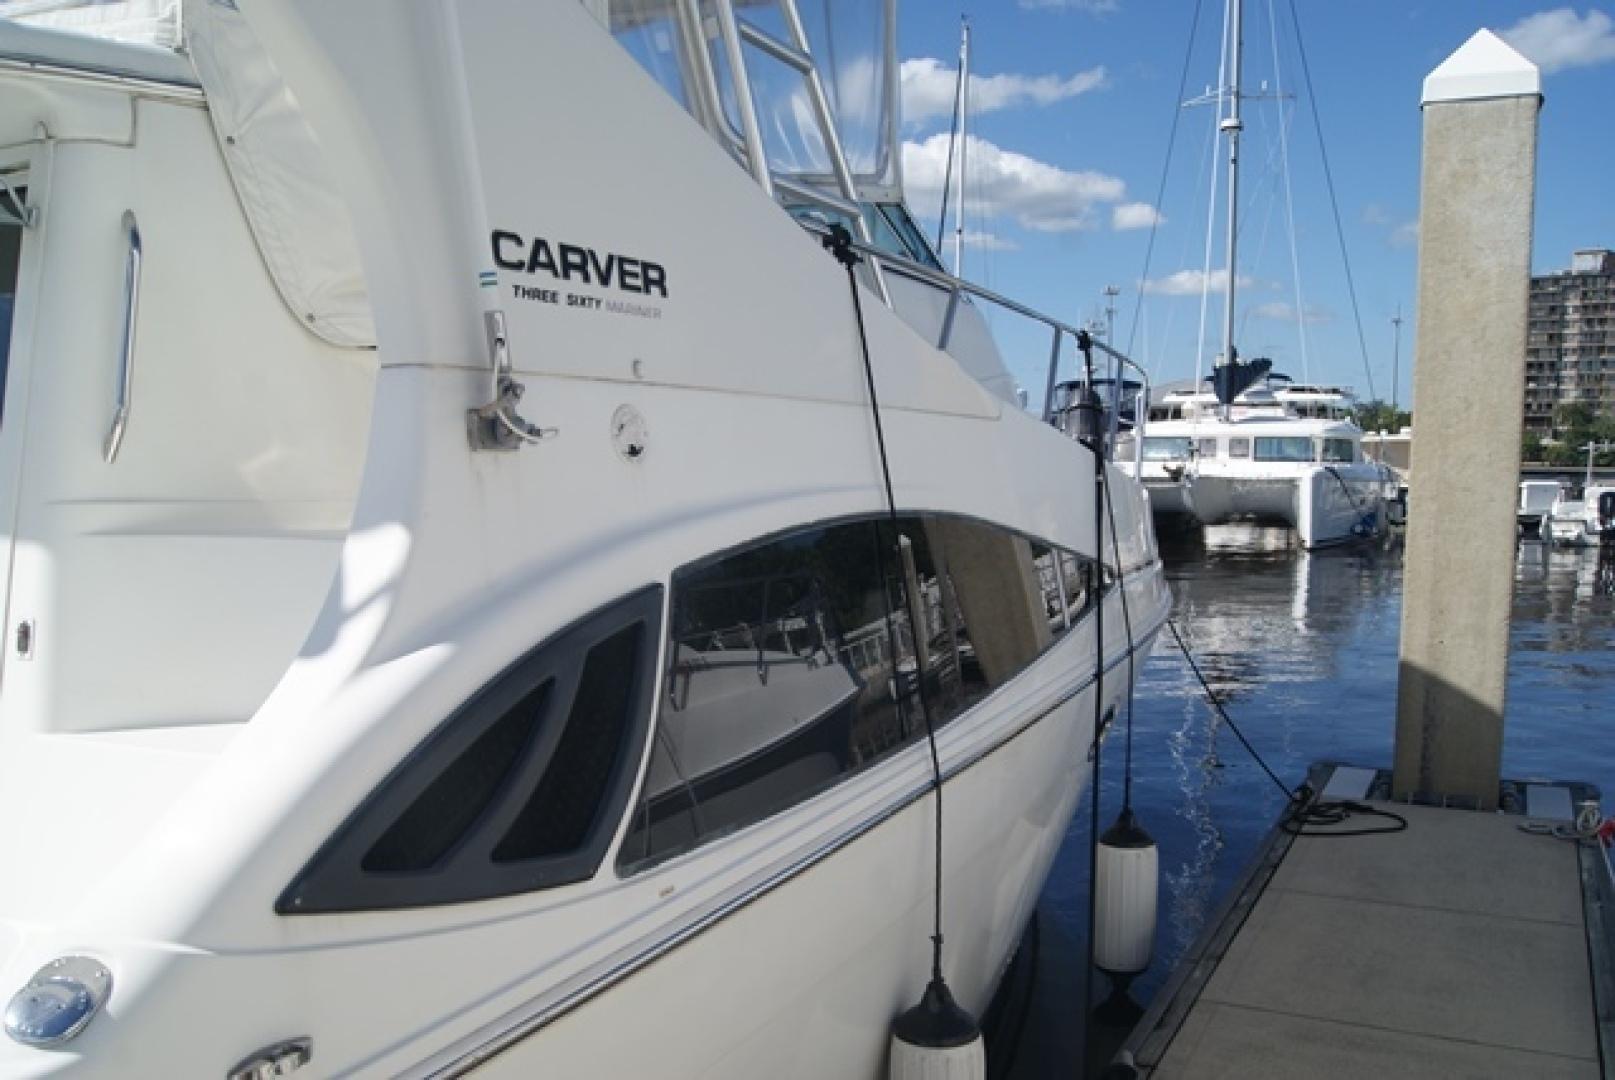 Carver-360 Mariner 2004-Soul Mates II Jacksonville-Florida-United States-1445543 | Thumbnail